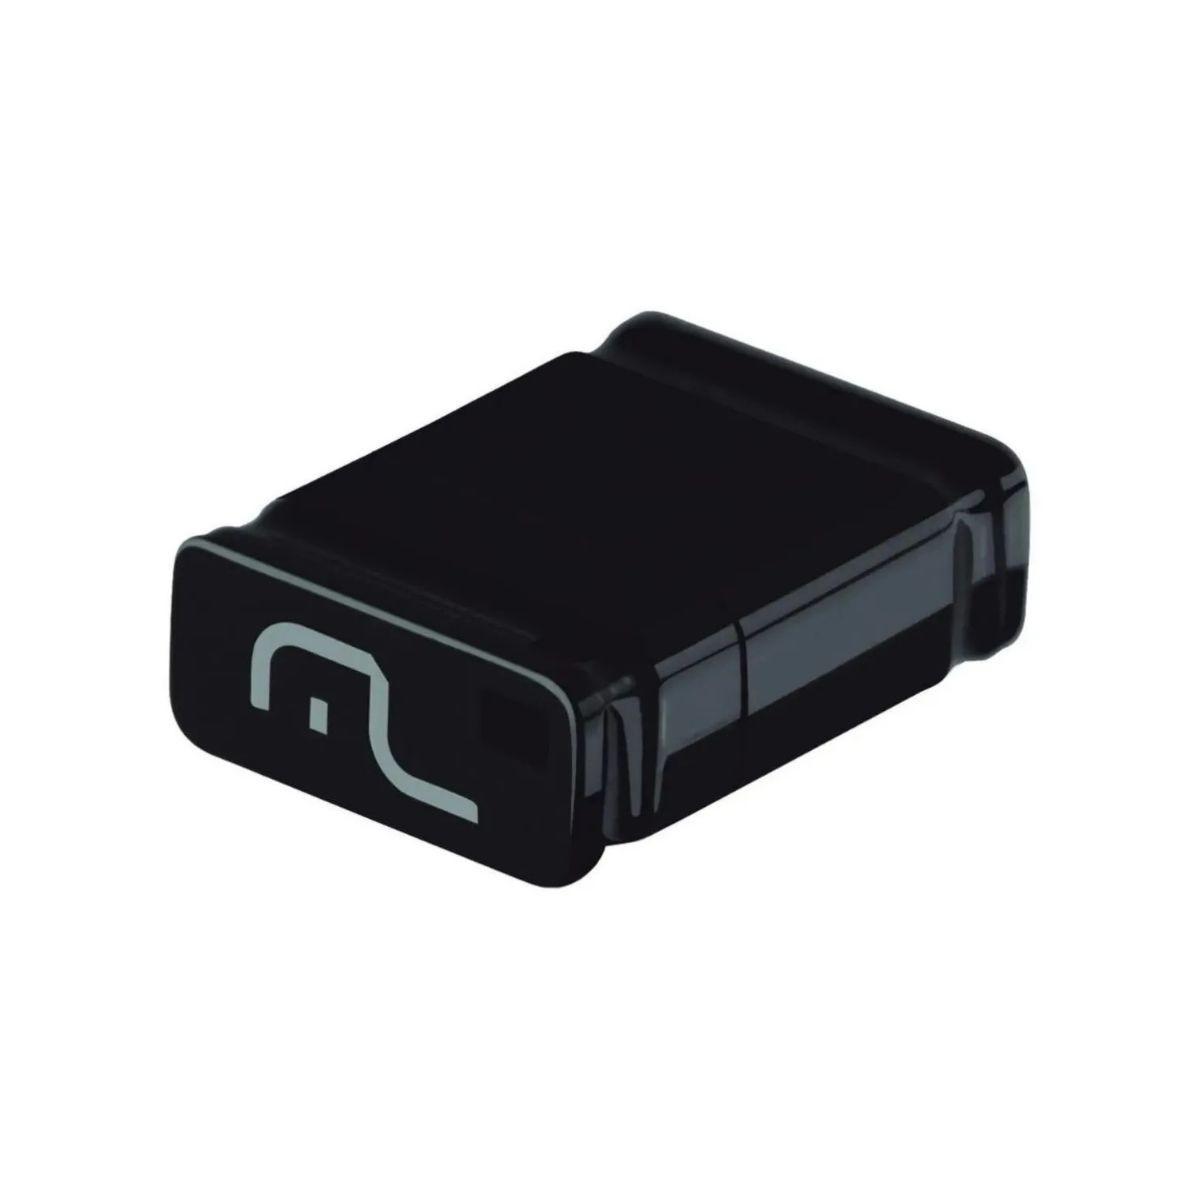 Pendrive Multilaser 16GB 2.0 Nano Preto Leitura 10 MB/s Gravação 3 MB/s